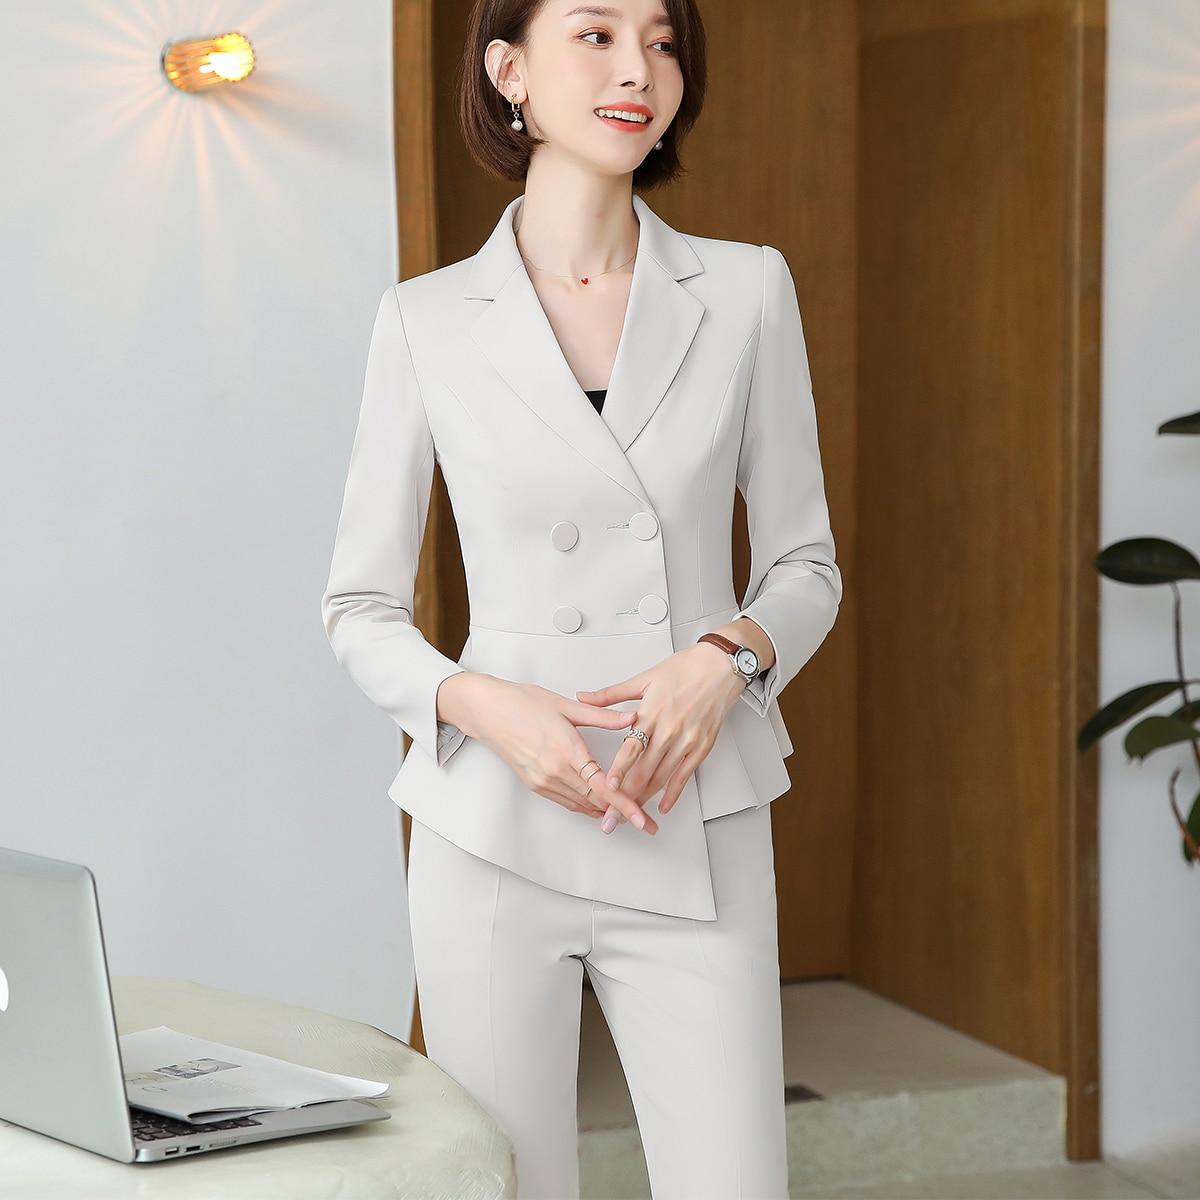 Female Elegant Formal Office Work Wear OL Women Pant Suit Career Wear Wine Ruffle Double Breasted Blazer Pant Suits 2 Pieces Set